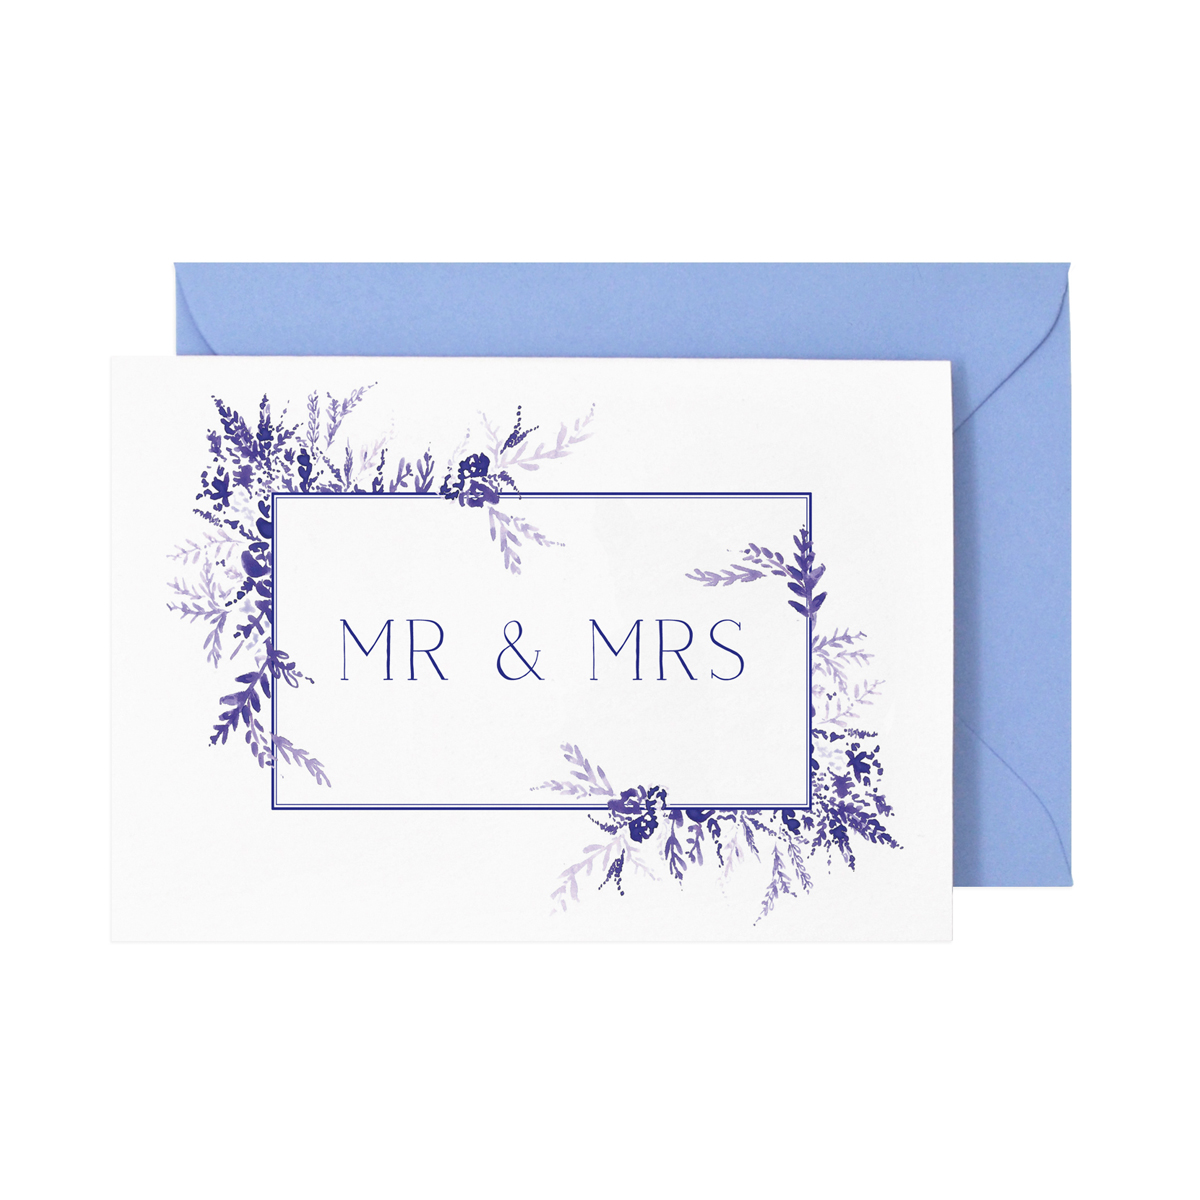 Mr & Mrs Card  £3.50